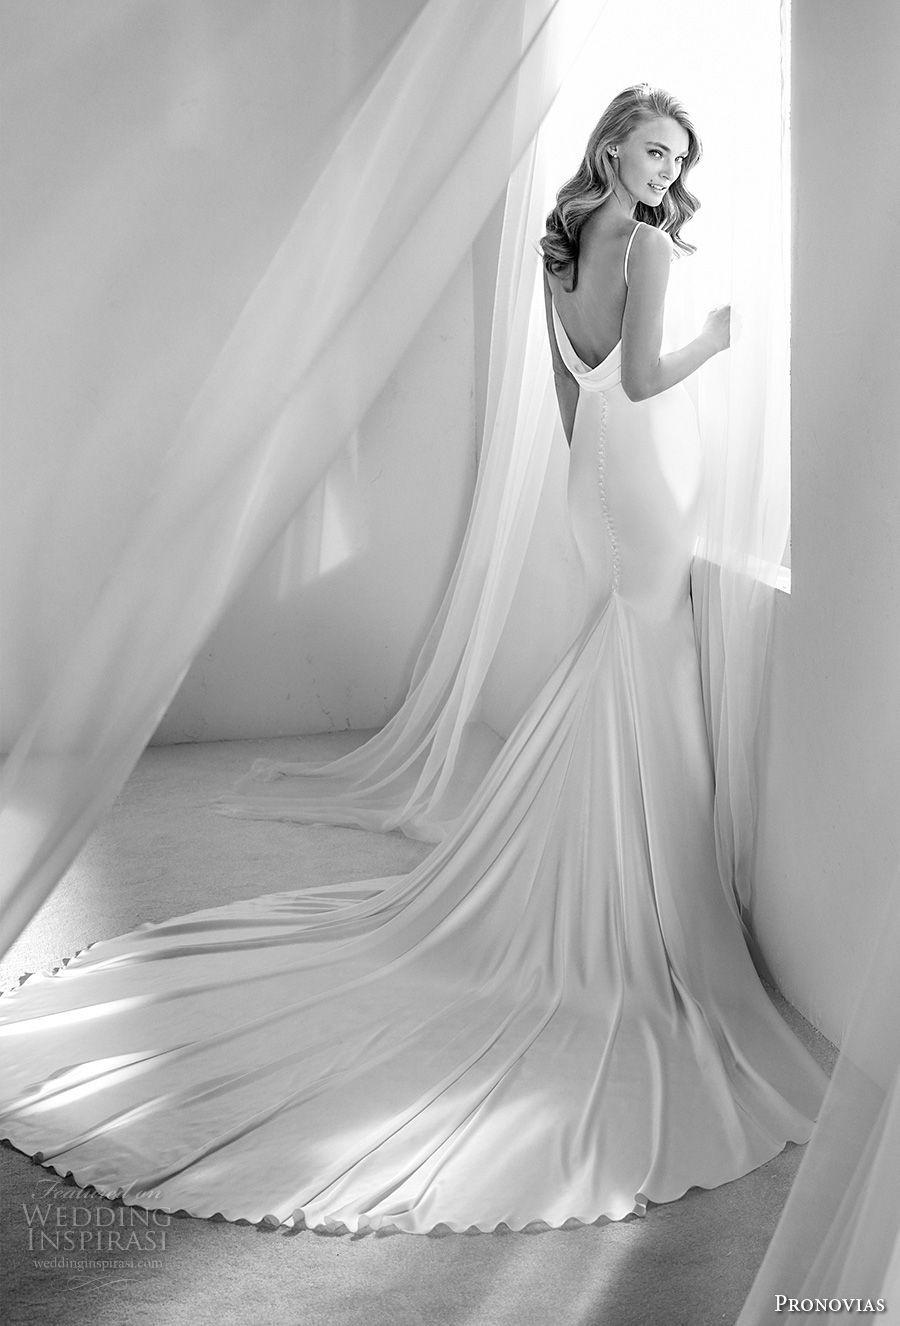 Atelier pronovias wedding dresses atelier pronovias chapel